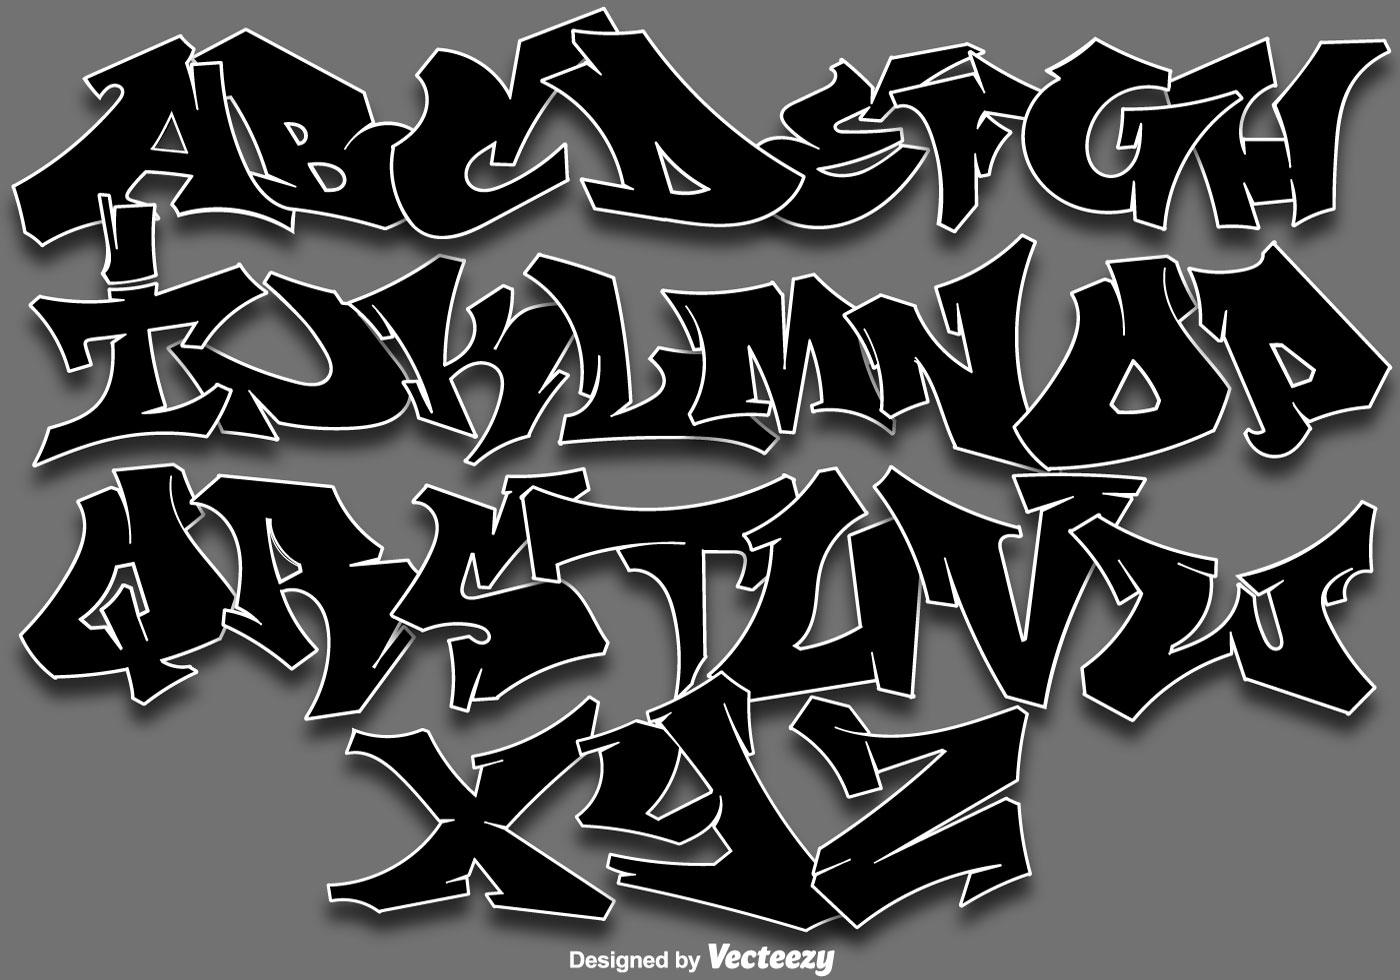 Vektor graffiti alfabet letters ladda ner gratis - Grafiti alpabet ...